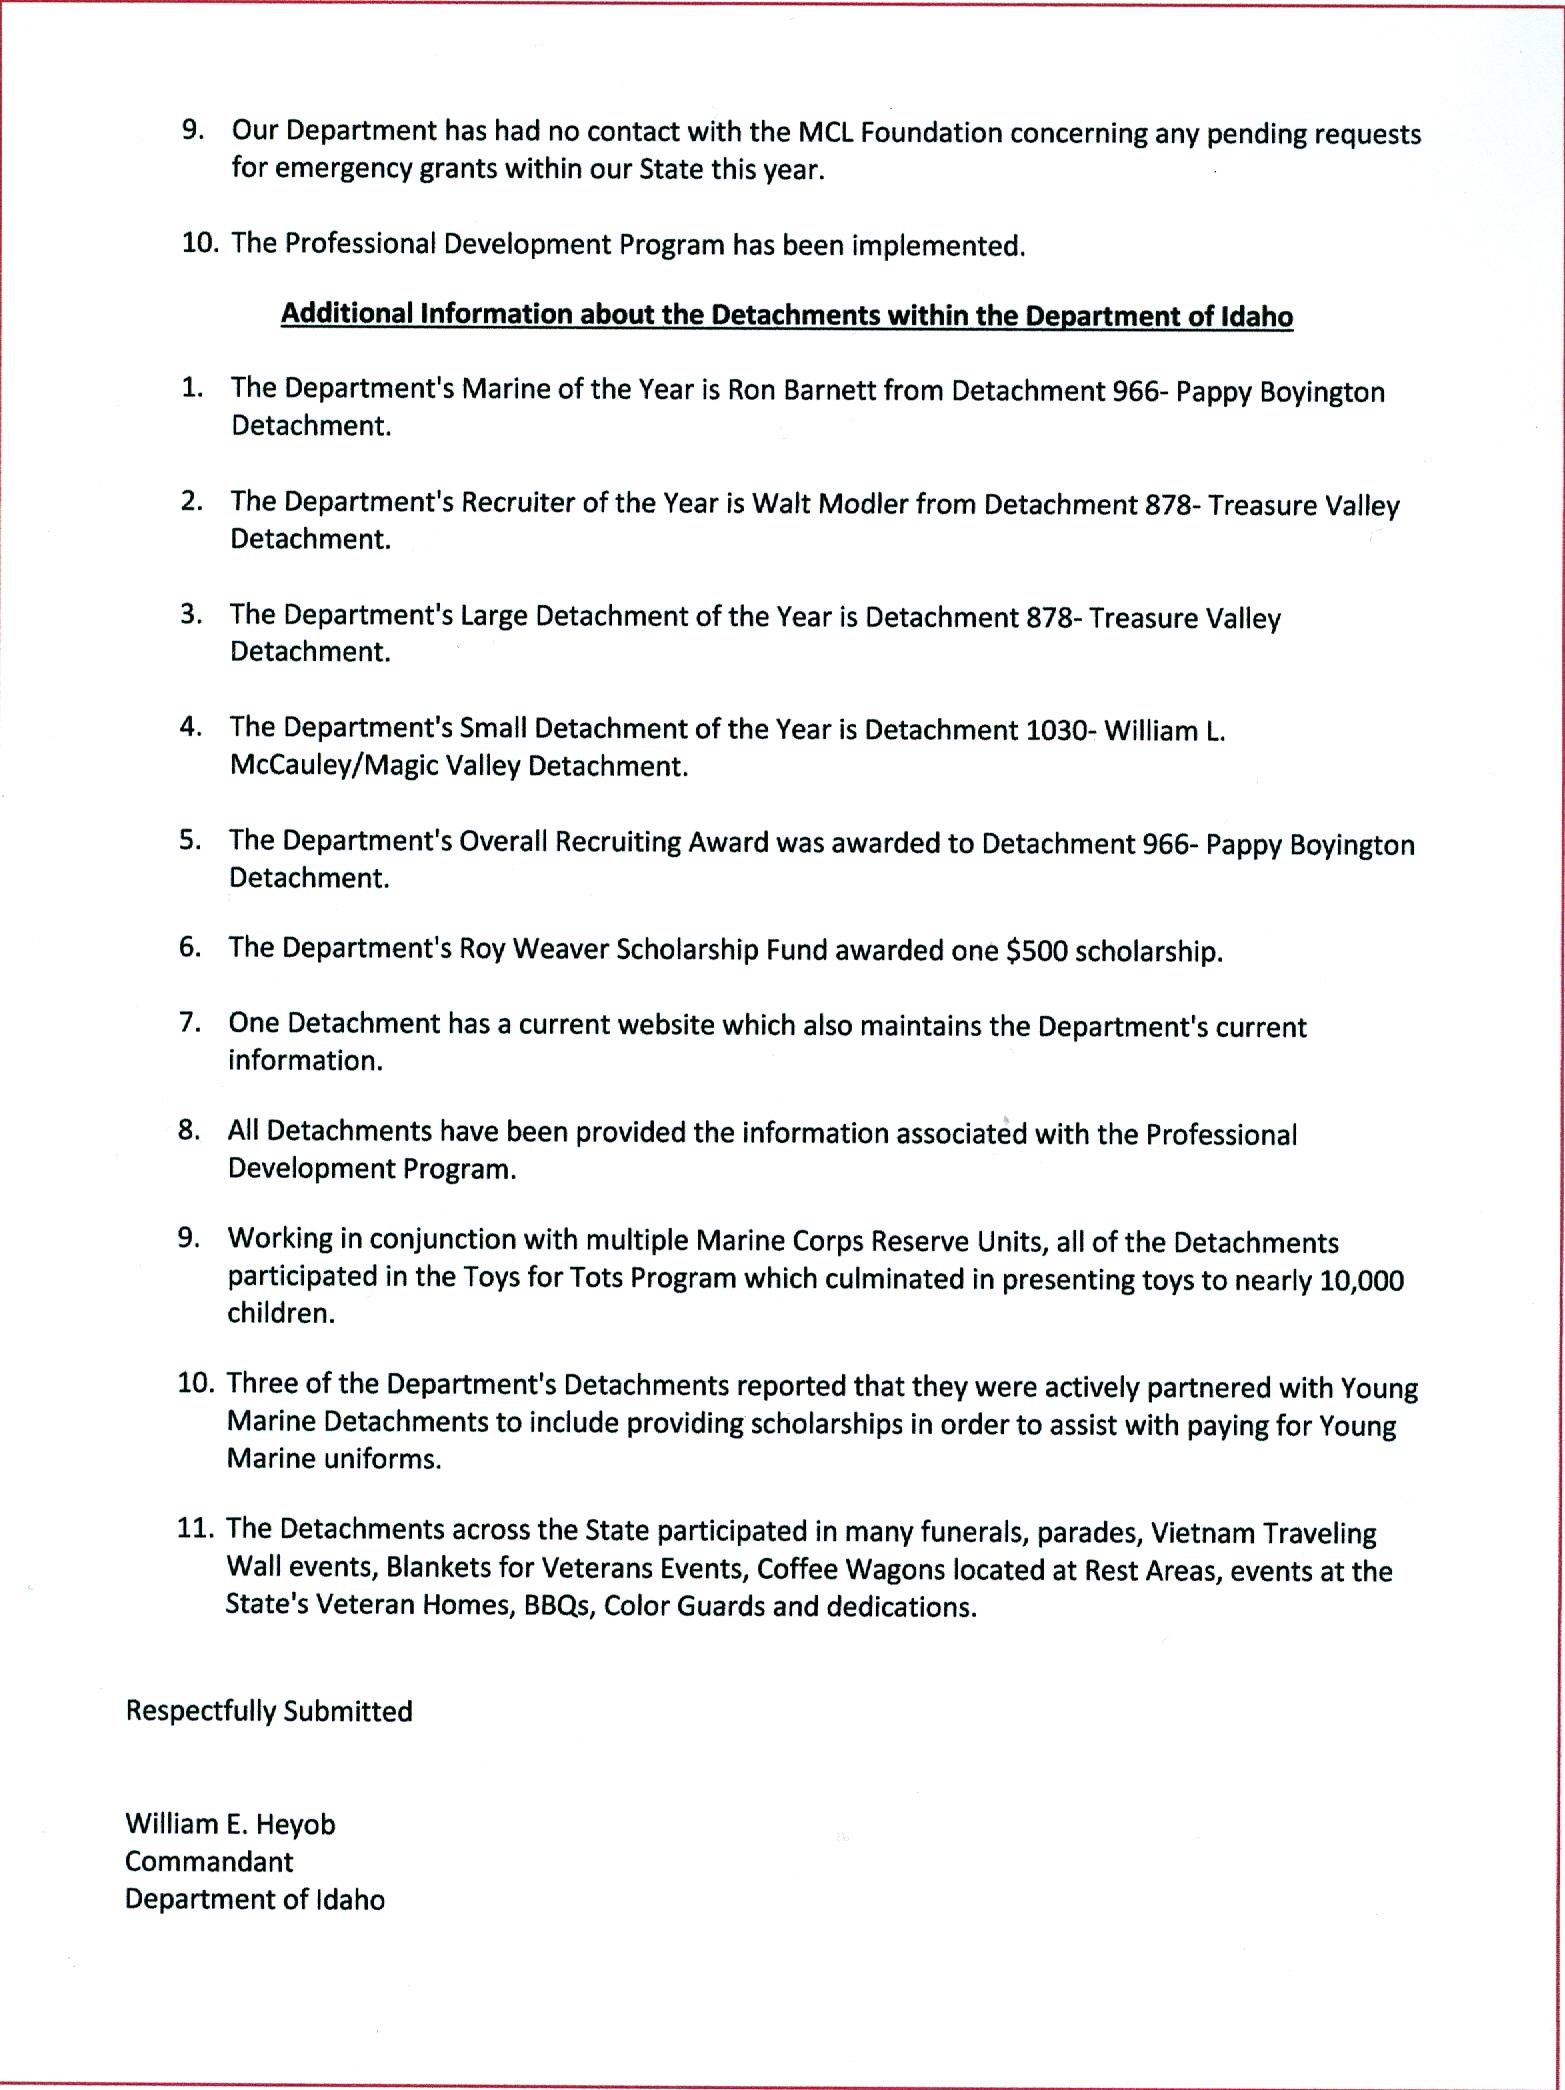 2016-department-of-idaho-activity-report-2